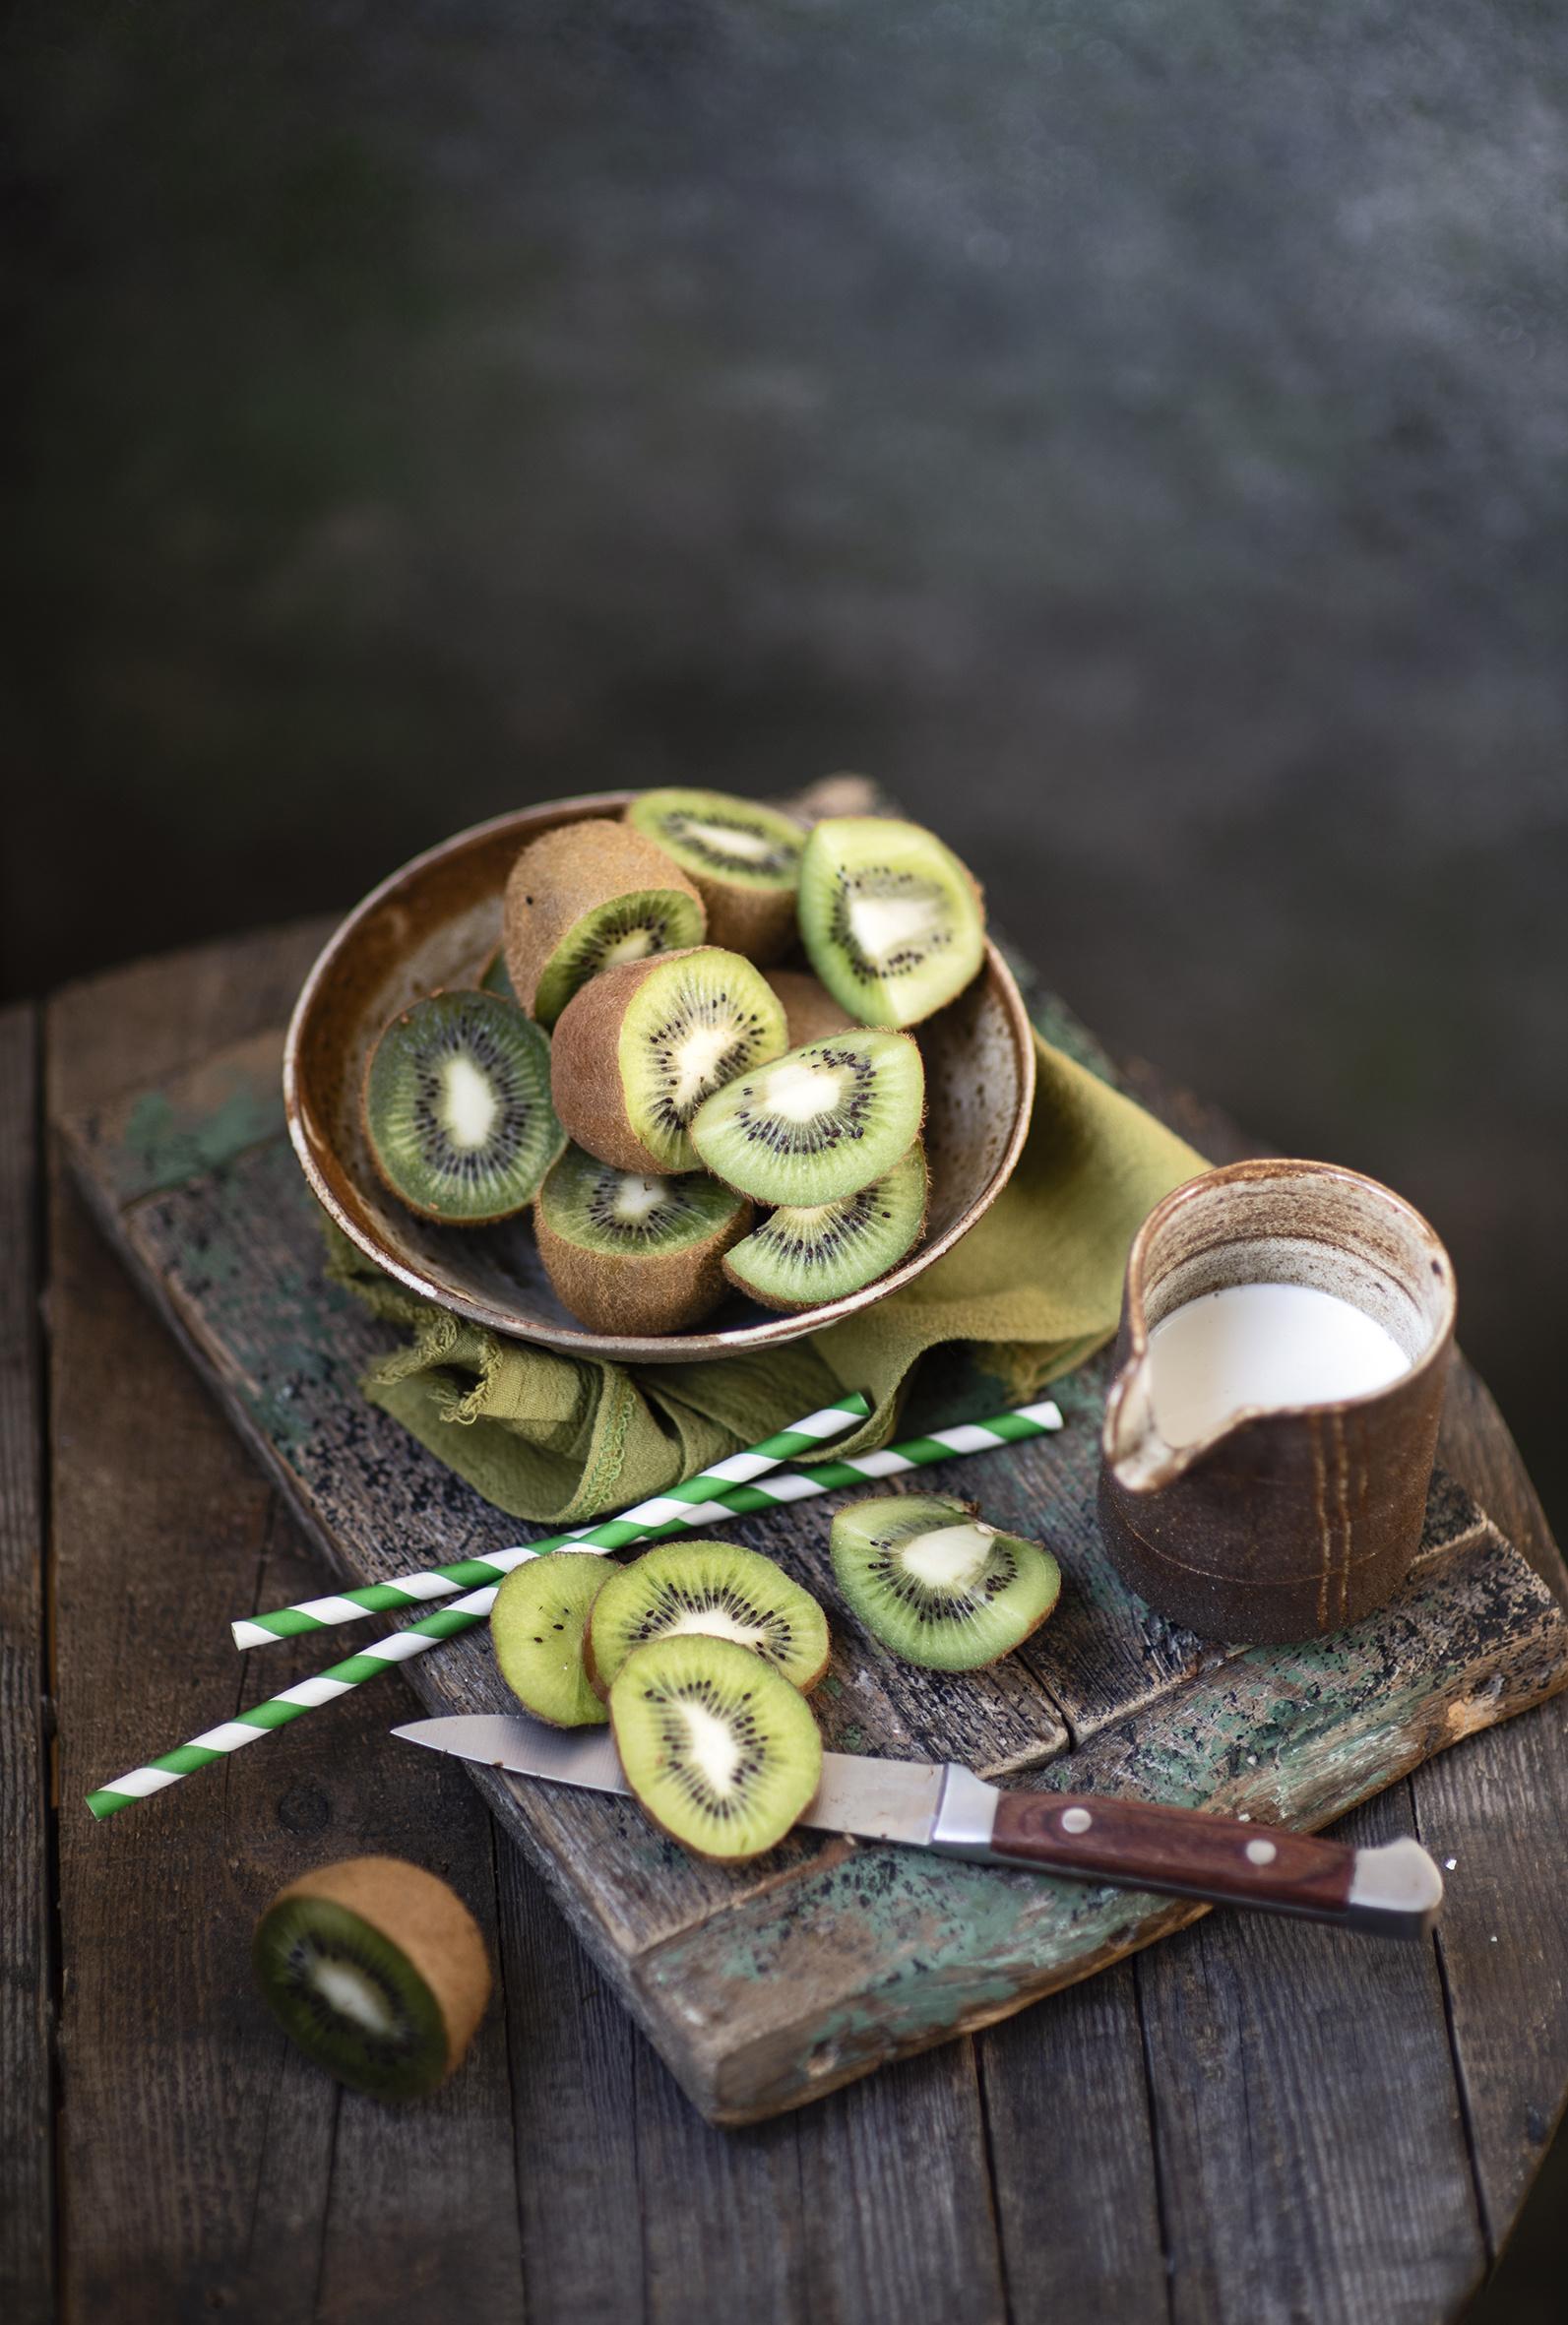 Photo Milk Knife Chinese gooseberry Food Sliced food Wood planks  for Mobile phone Kiwi Kiwifruit boards